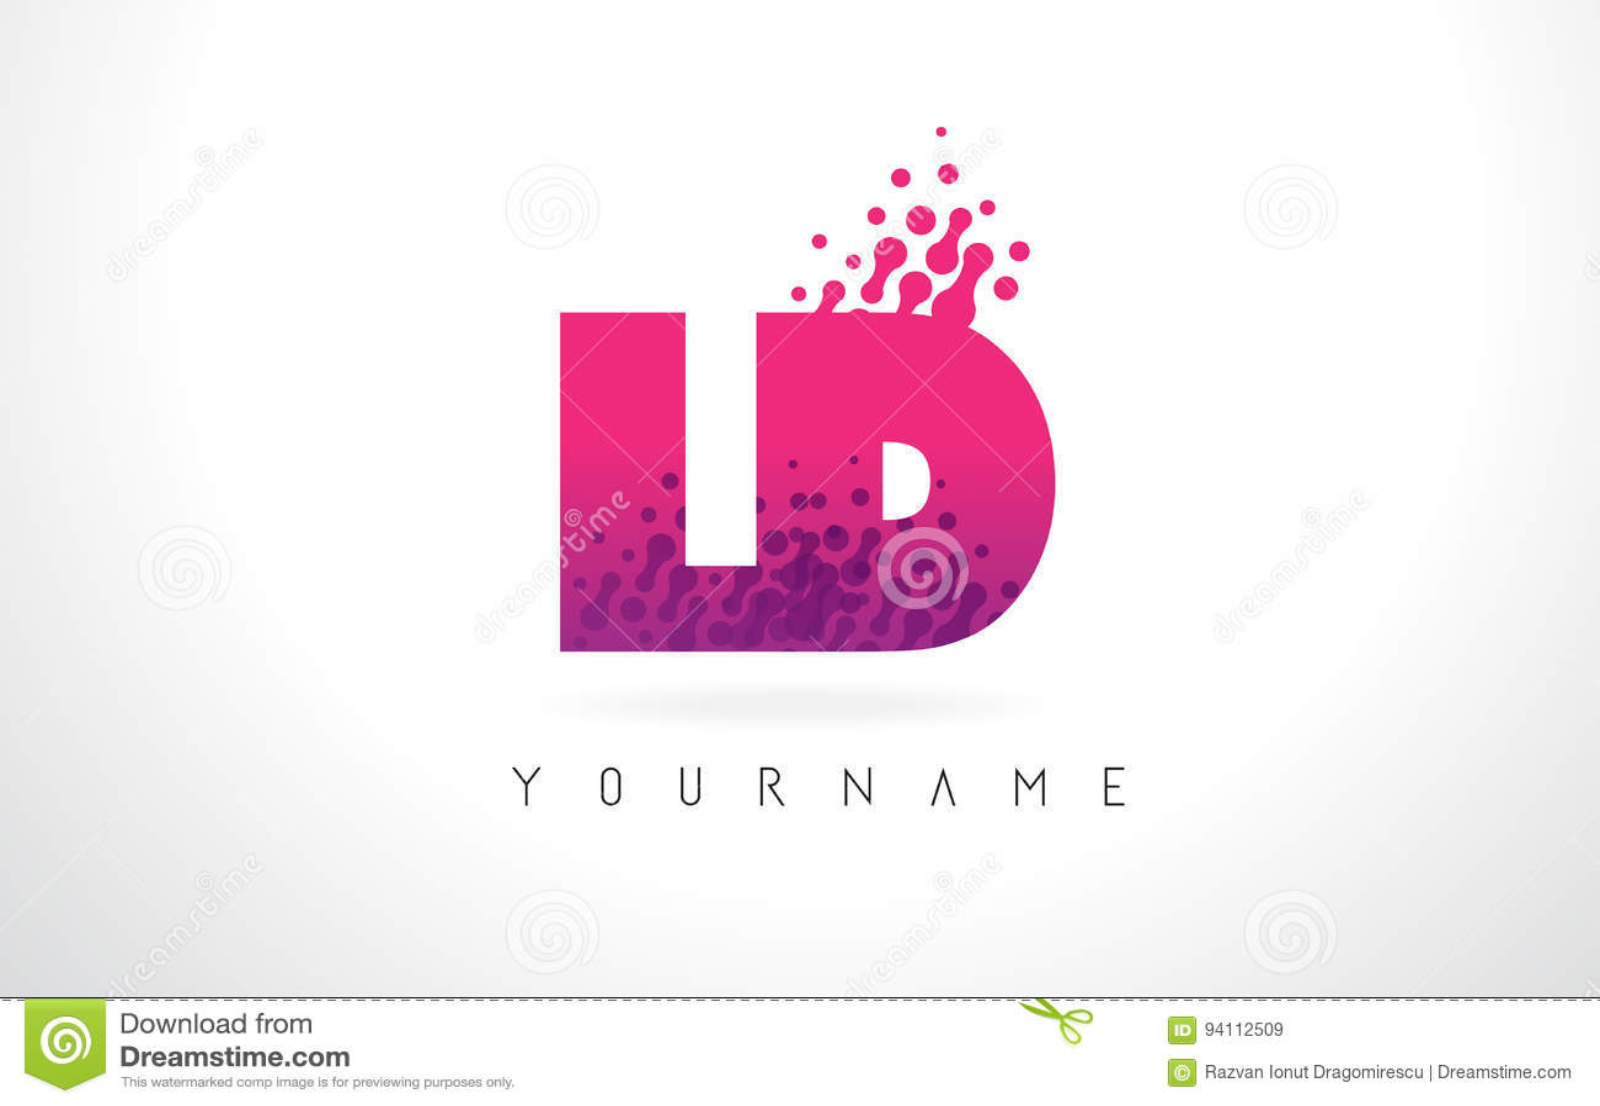 Ld L D Letter Logo With Pink Purple Color And Particles Dots Design